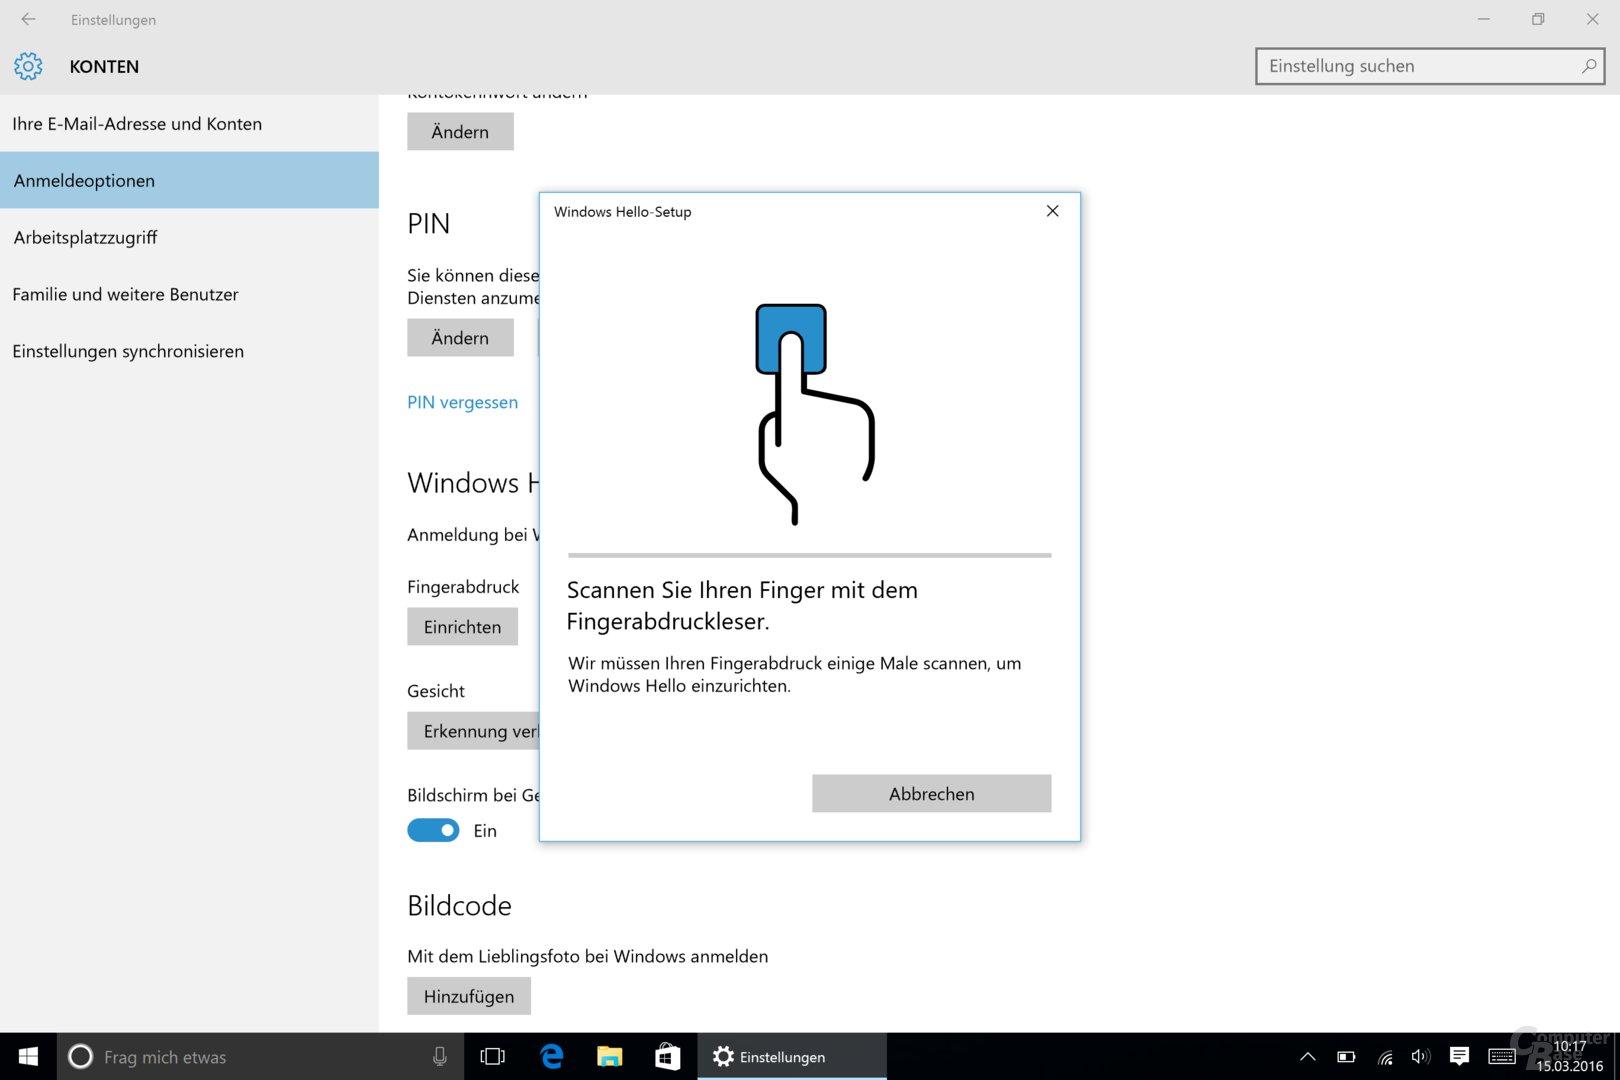 Fingerabdrucksensor auf dem Surface Pro 4